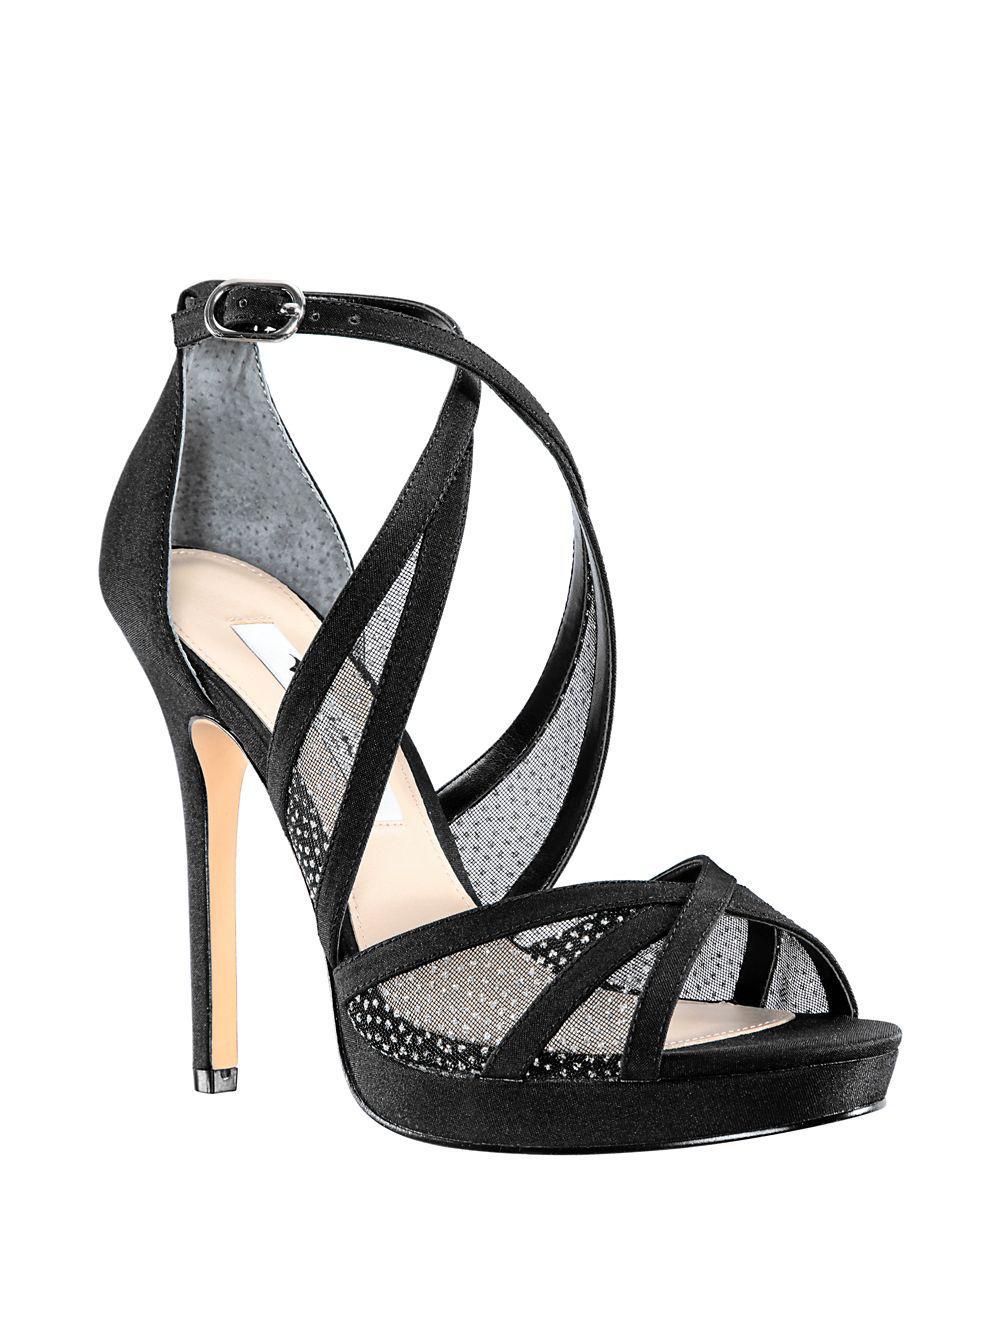 4488b469d26 Nina Fenna Platform Sandals in Black - Lyst